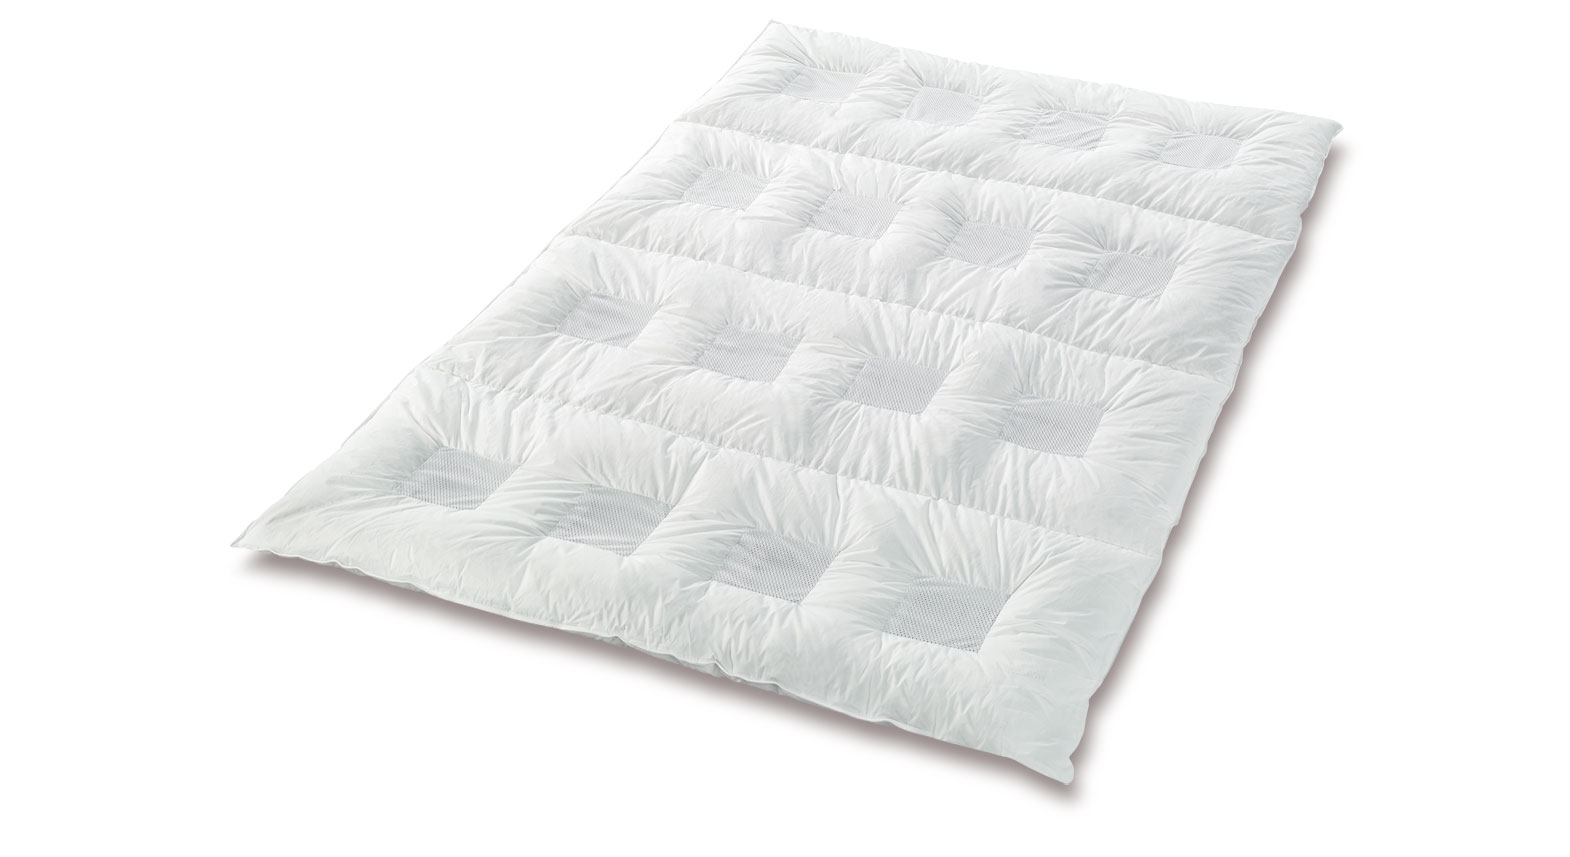 Daunen Bettdecke Clima Balance Premium Medium Übergröße